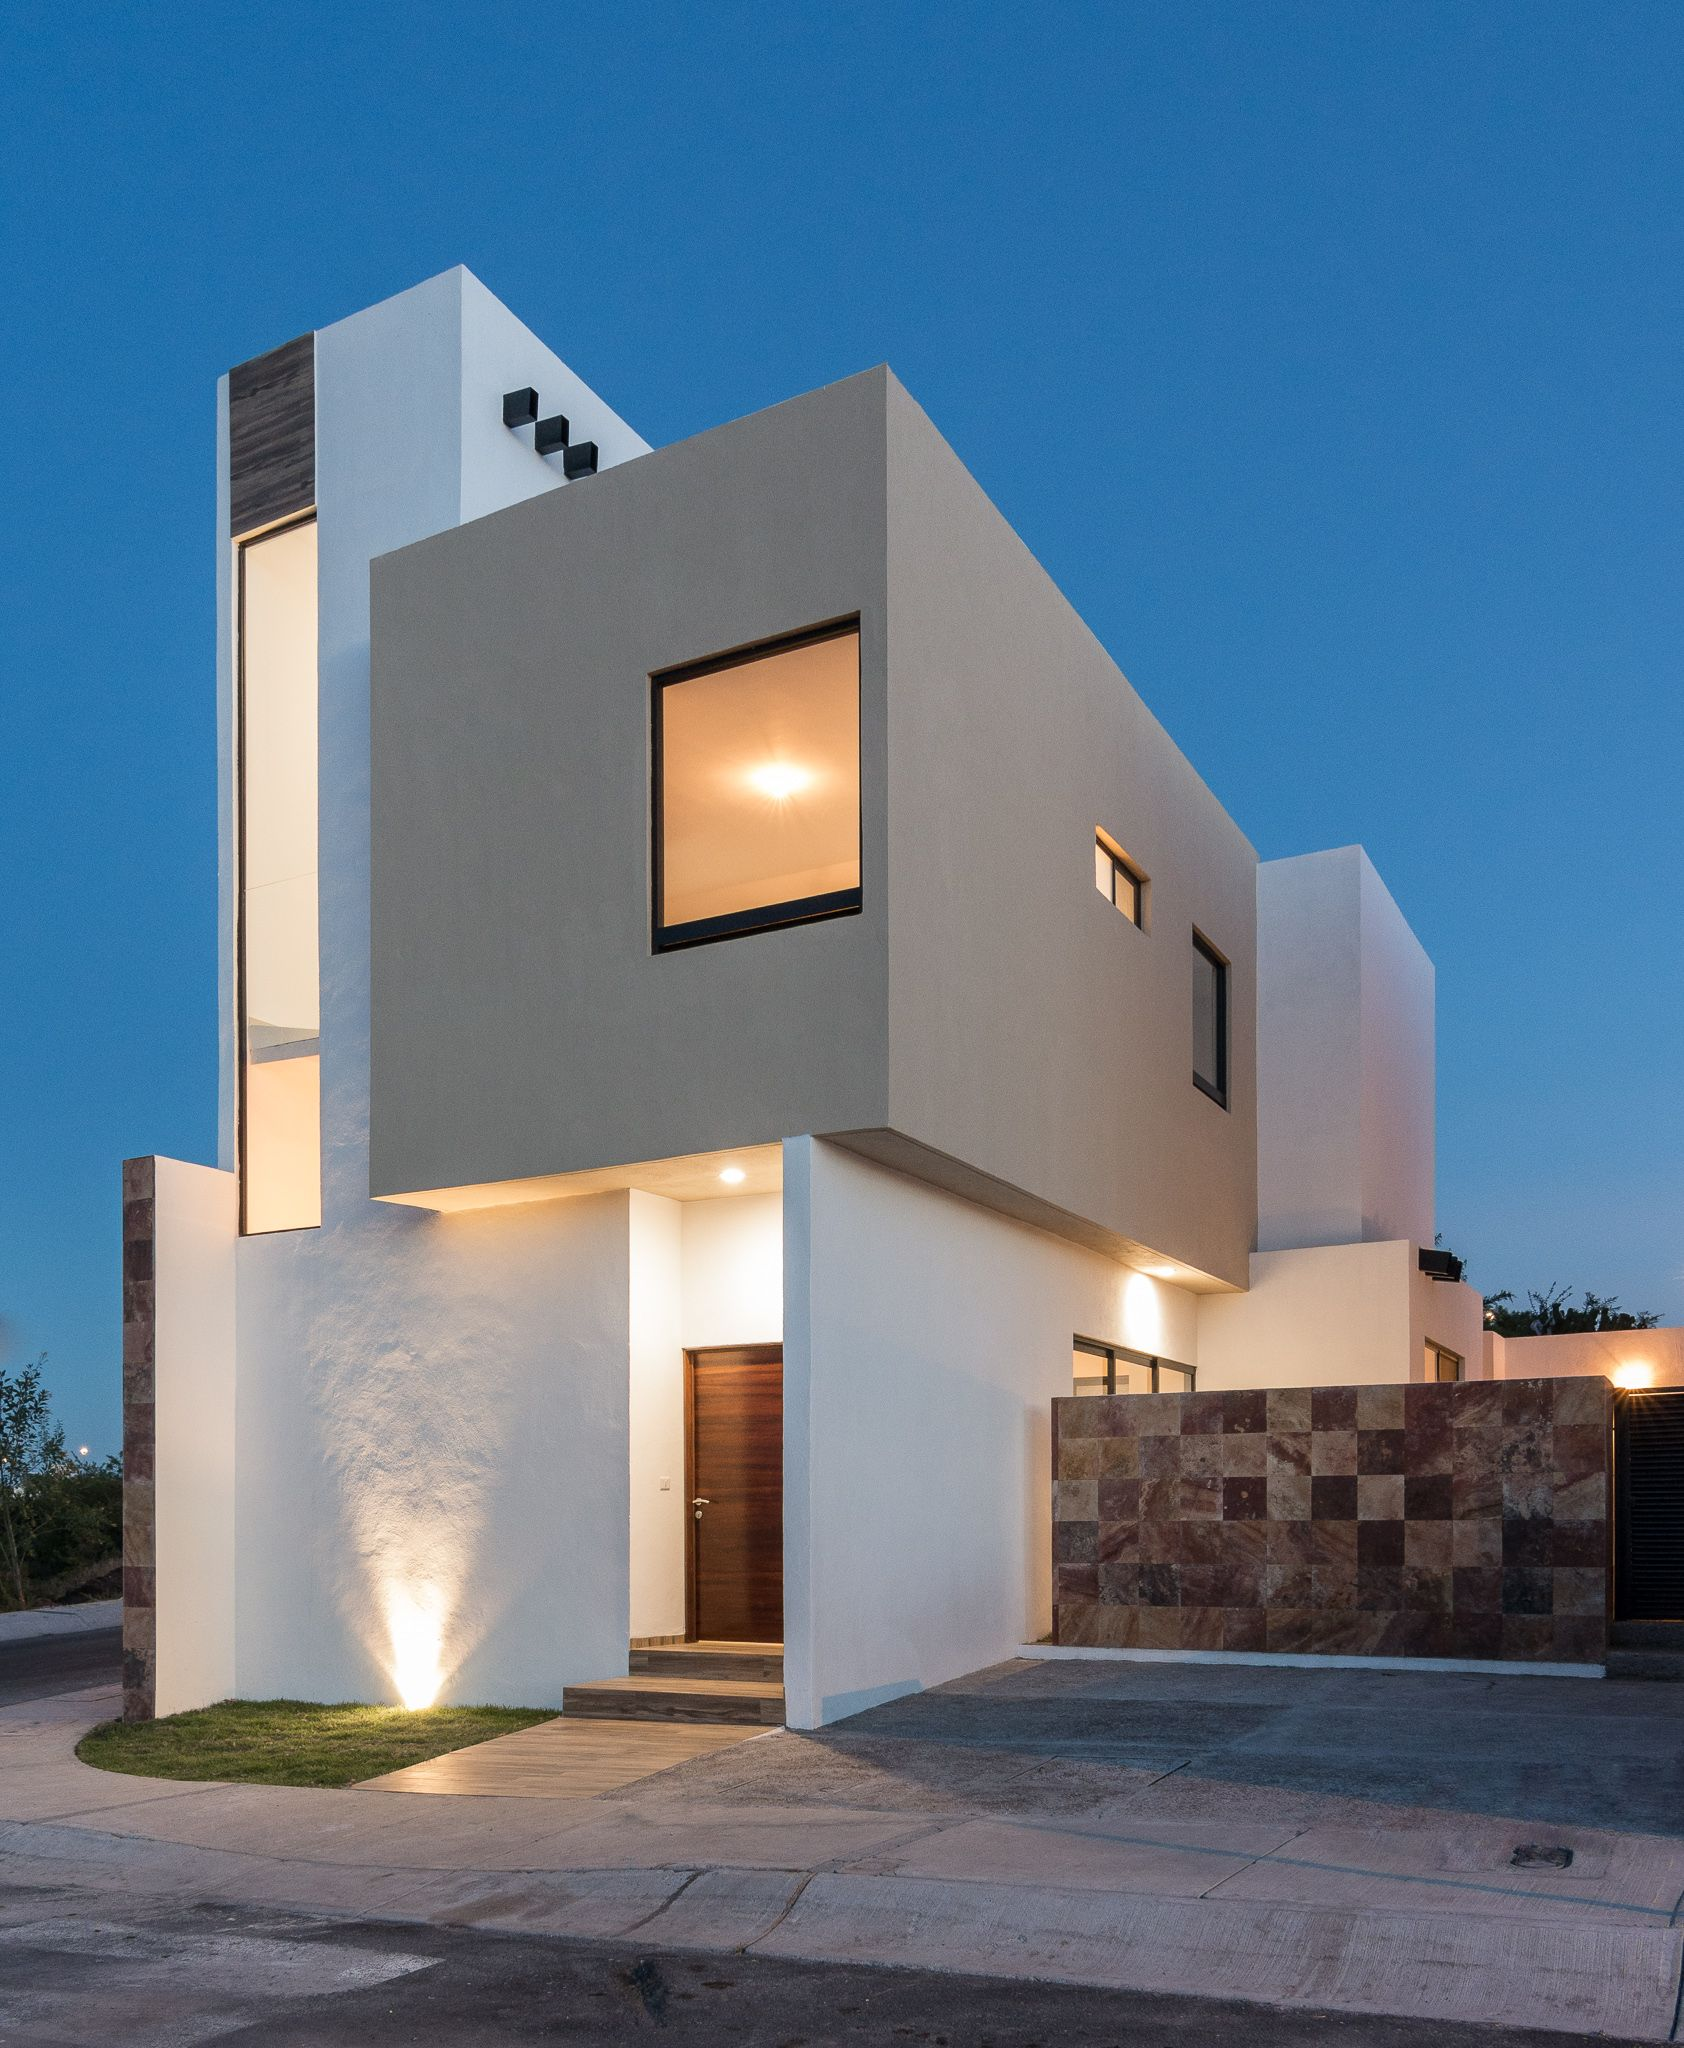 bonita casa habitacion de dos plantas zibata queretaro